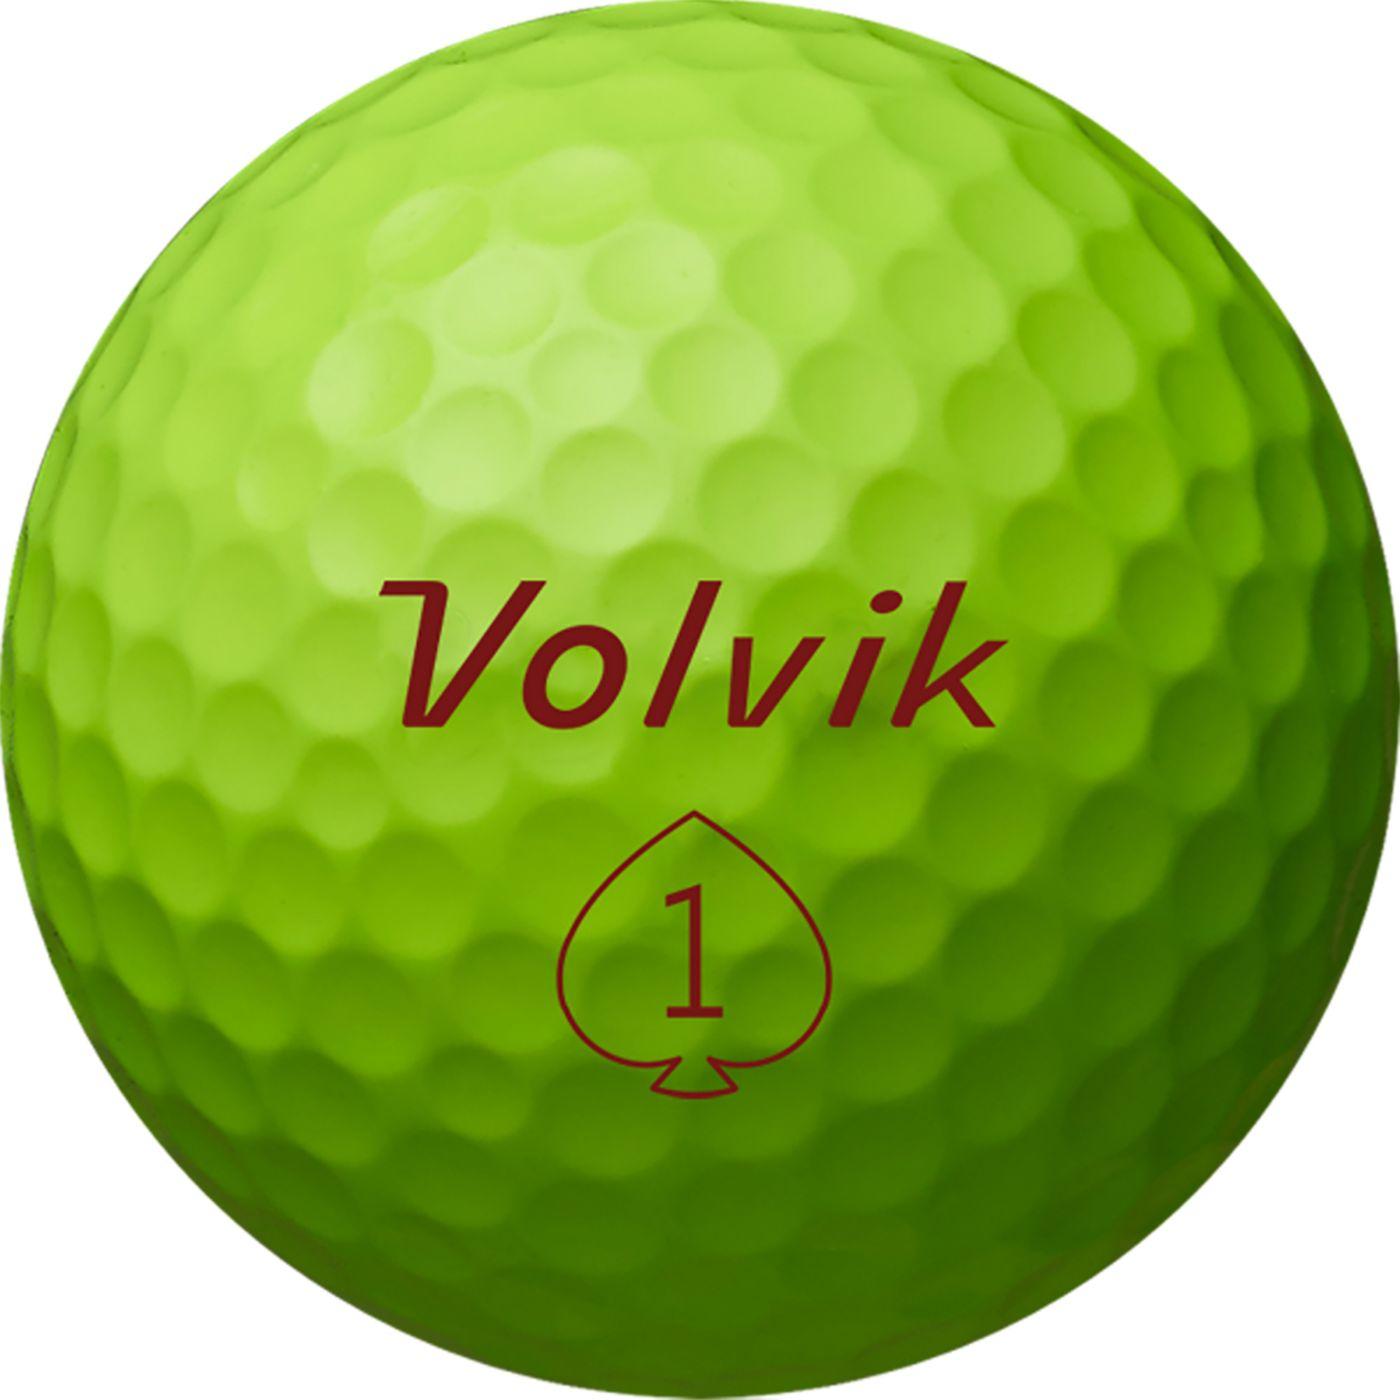 Volvik 2019 S4 Green Golf Balls